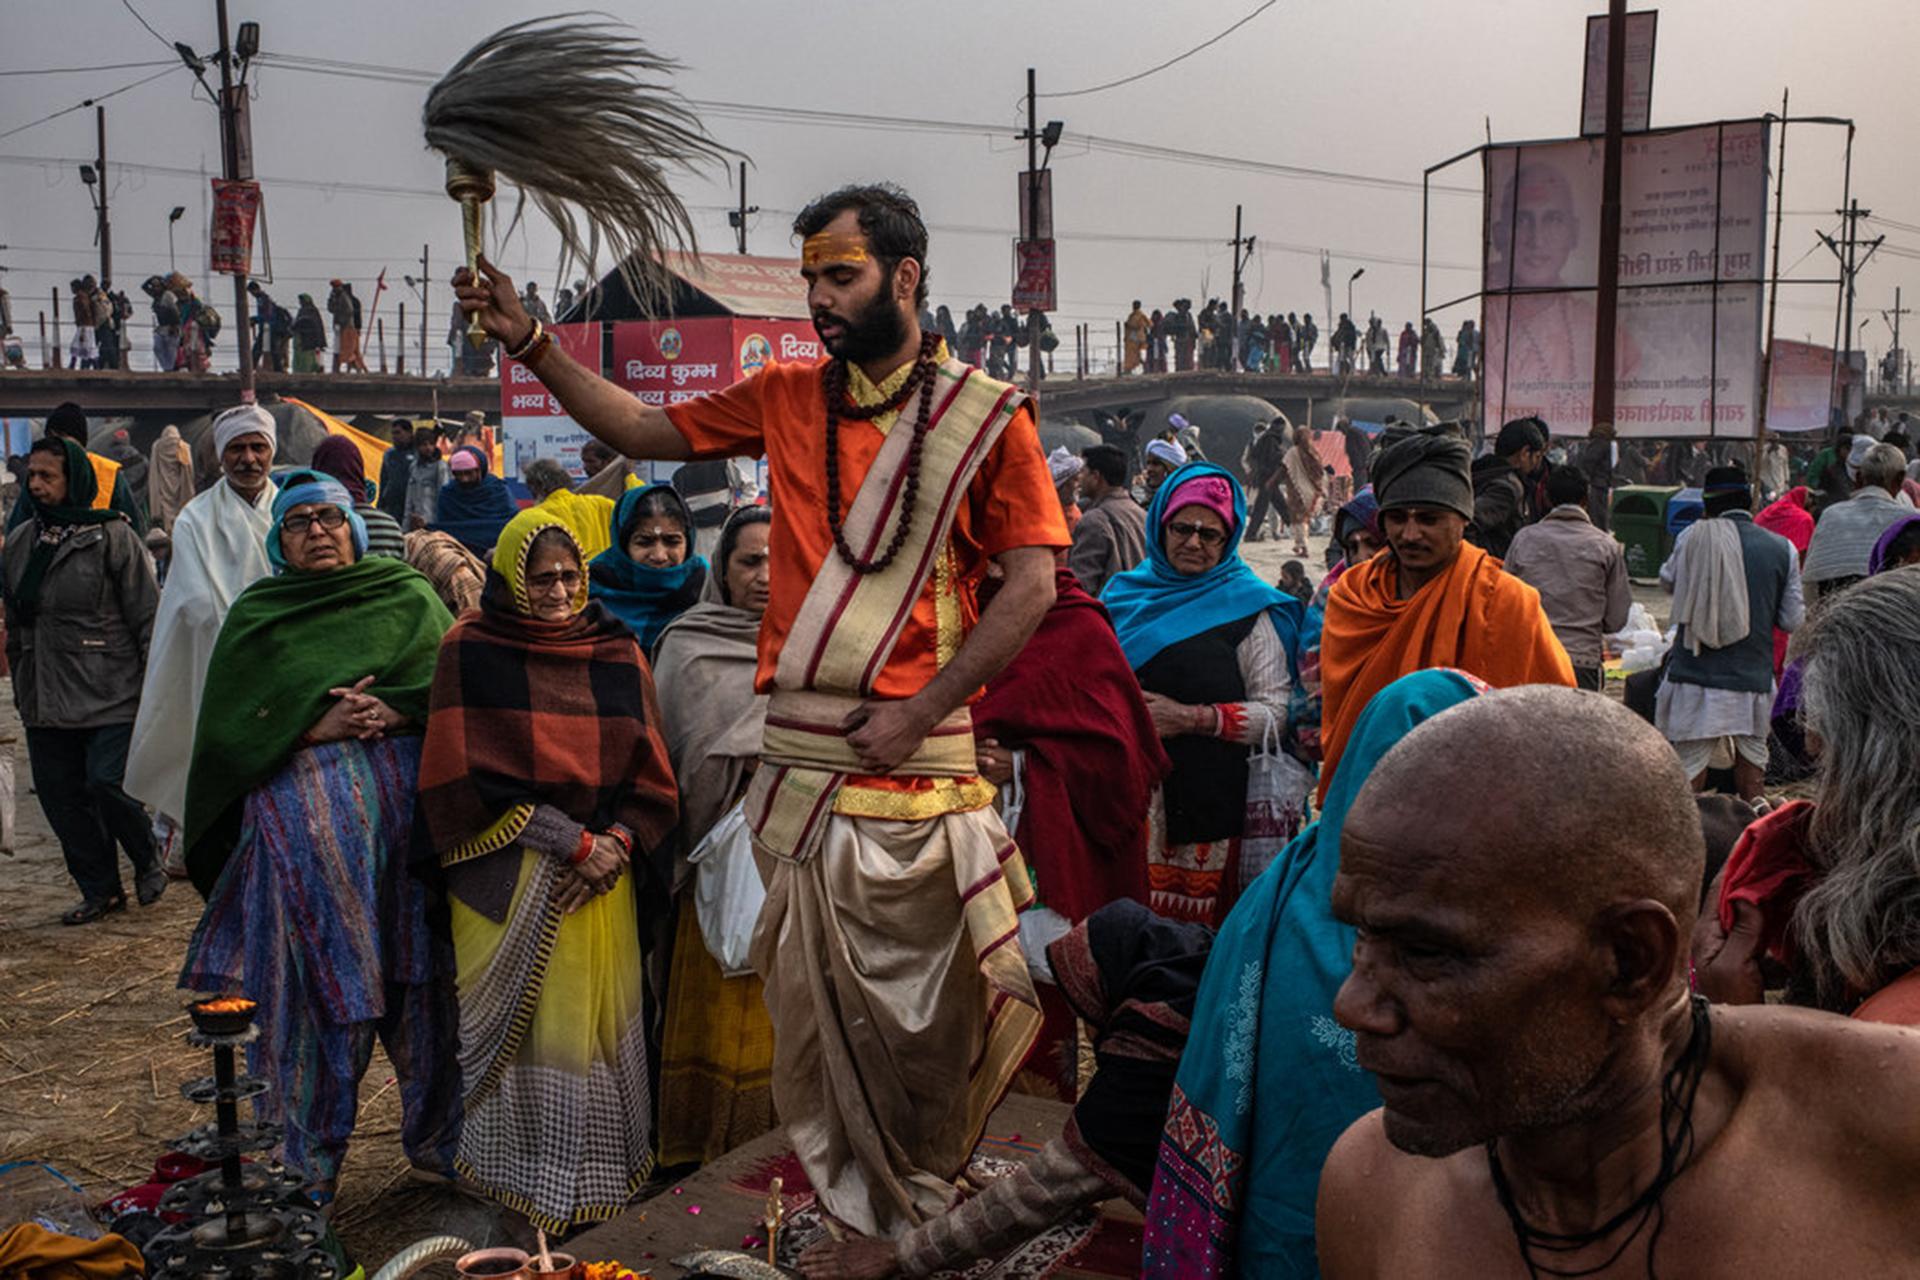 Un religioso hindú entonaba las plegarias matutinas. (The New York Times)